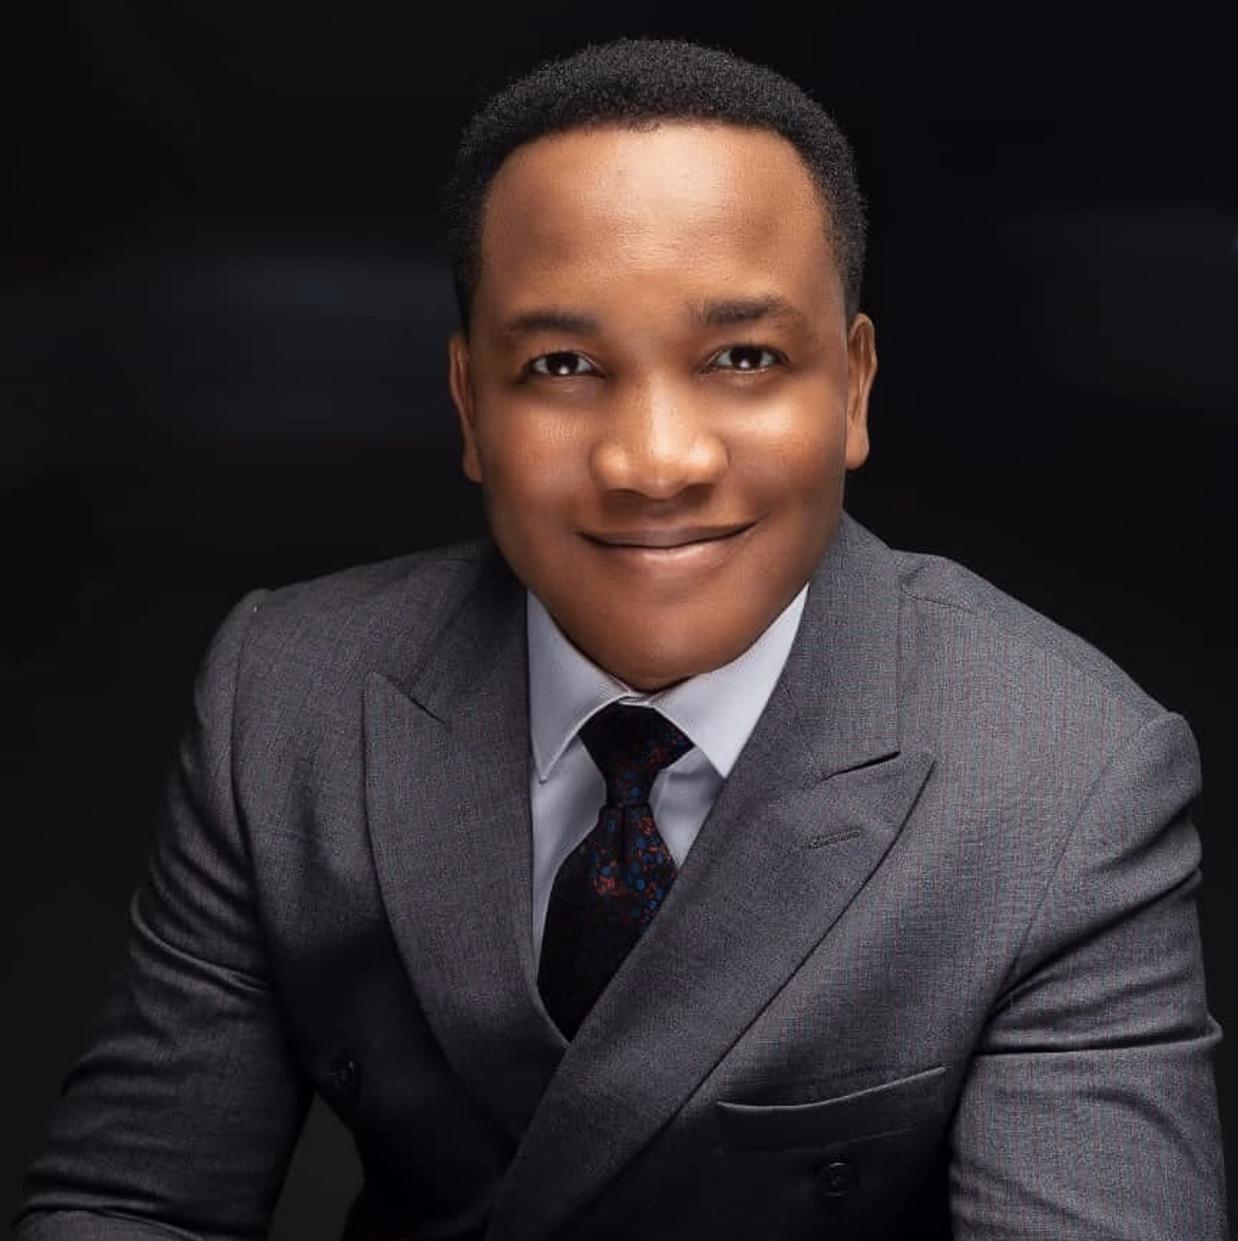 Happy Birthday Pastor Derrick, you